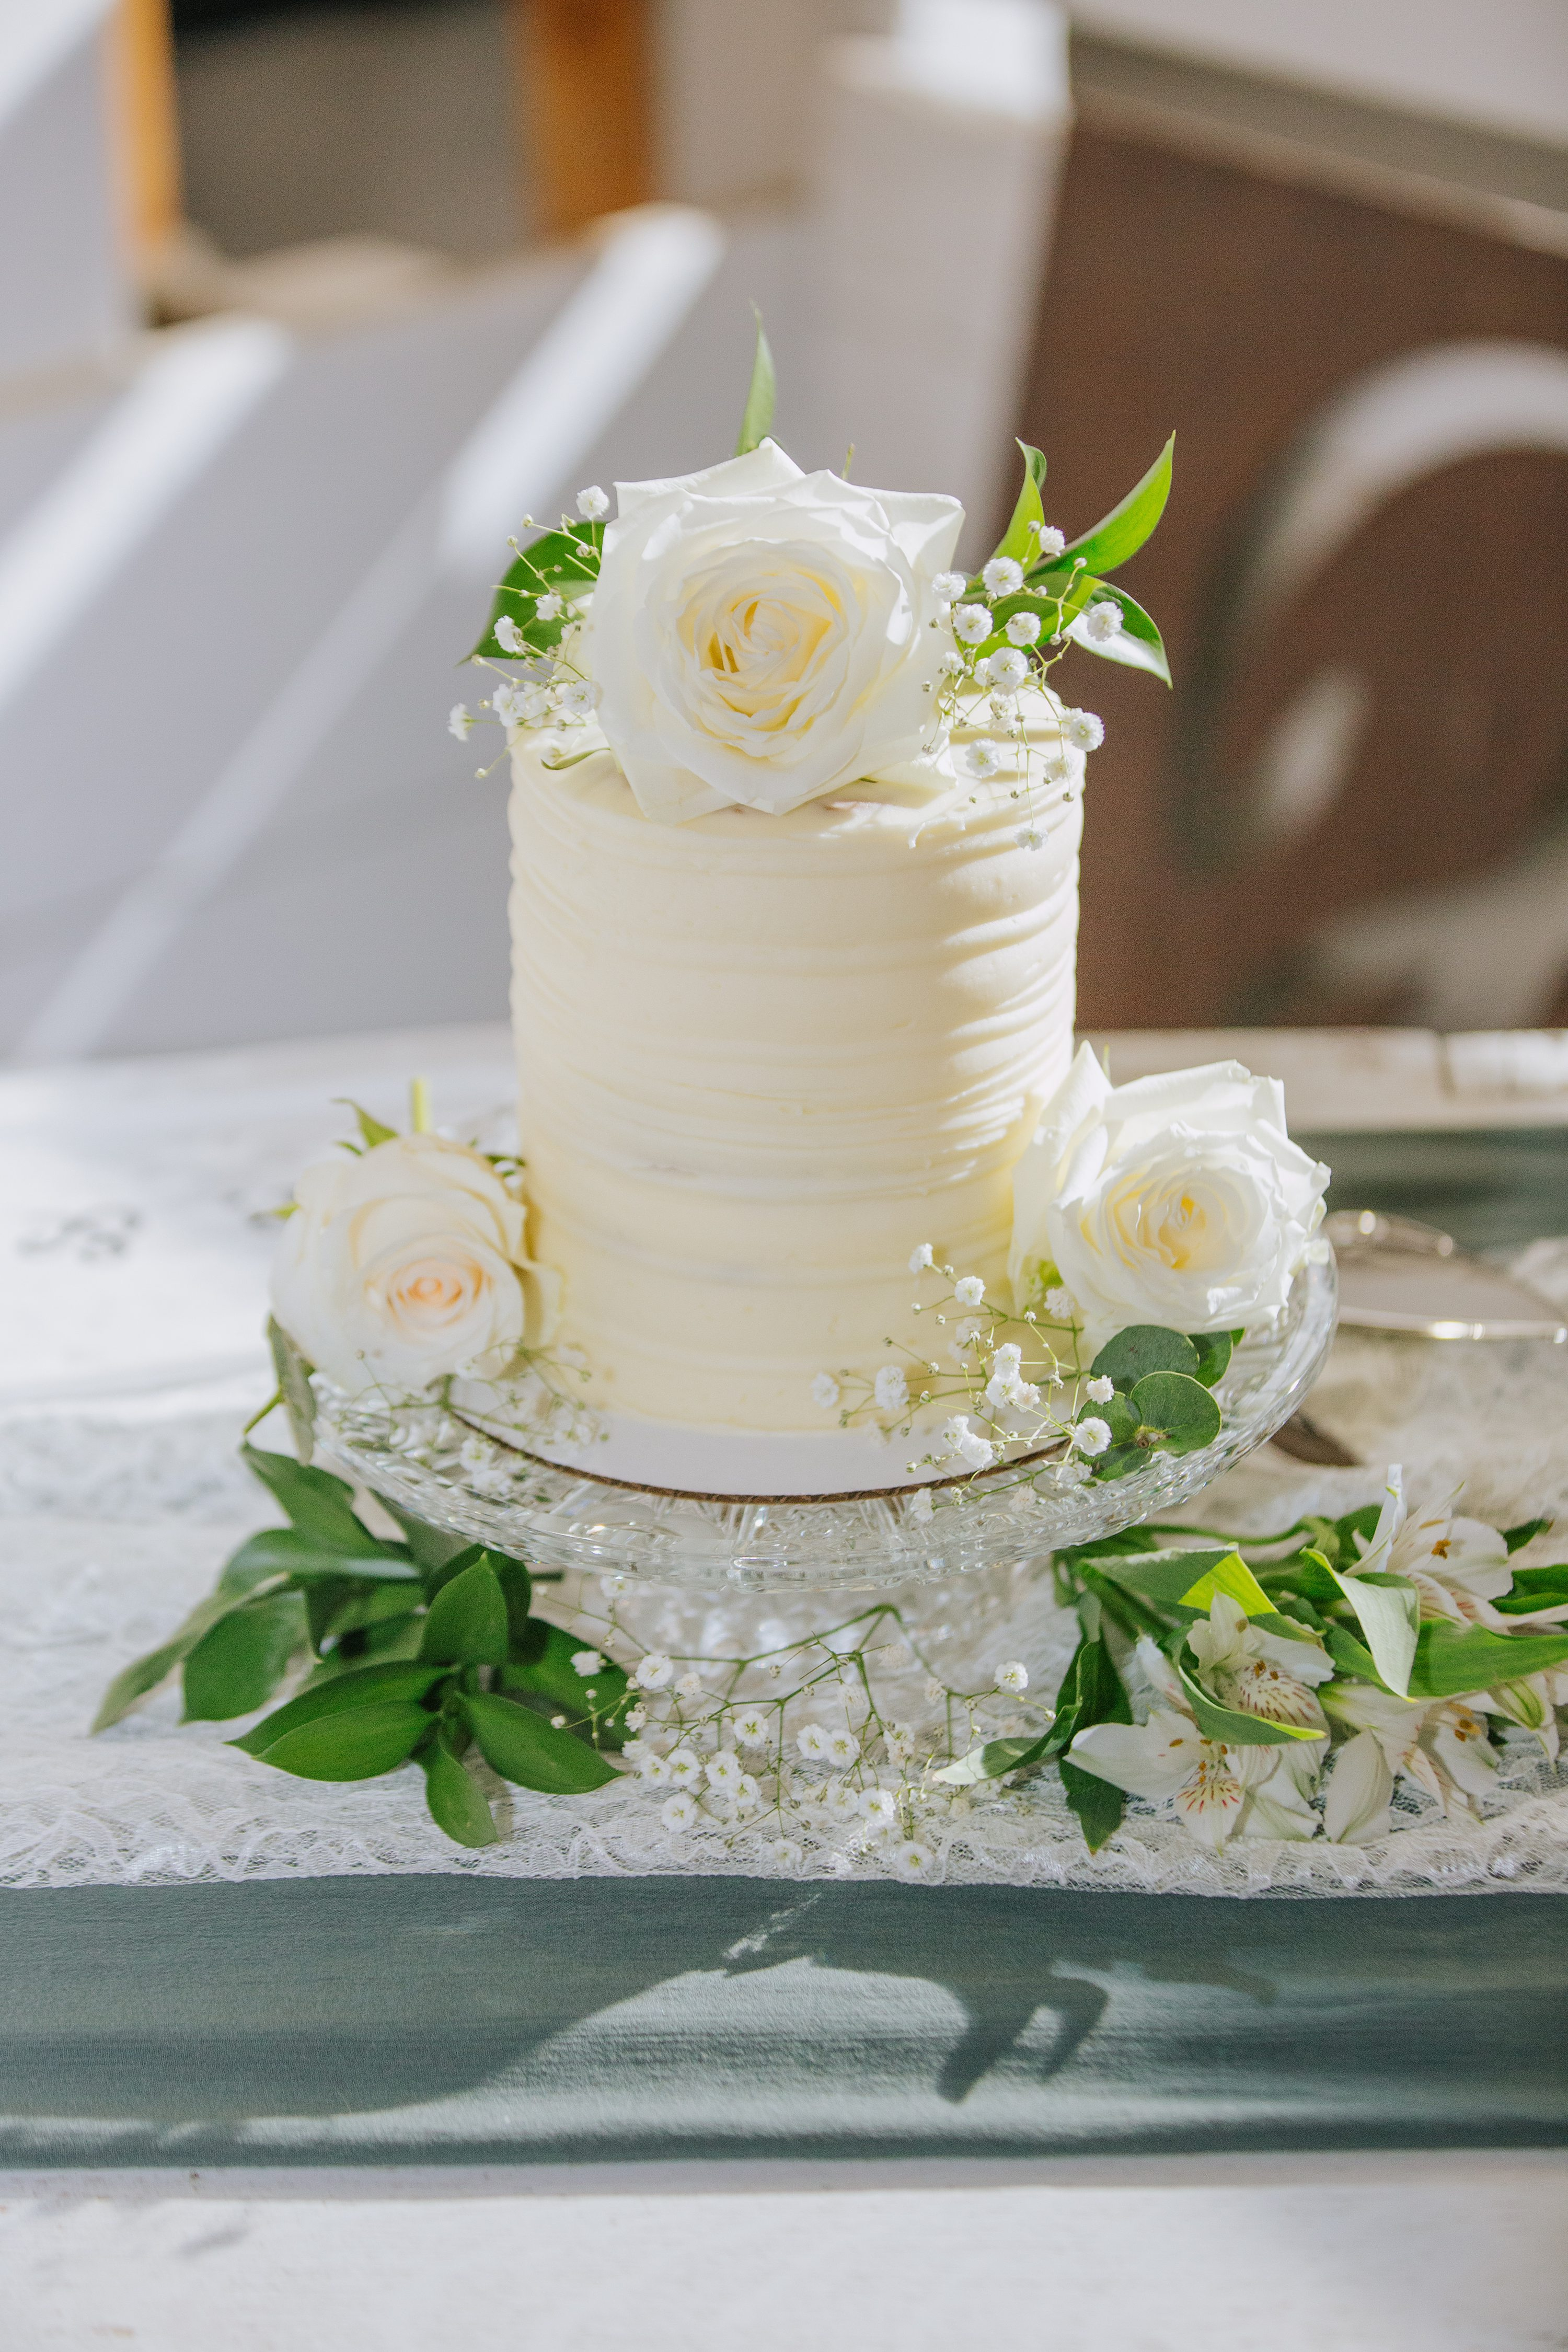 wedding cake,white roses,white cake